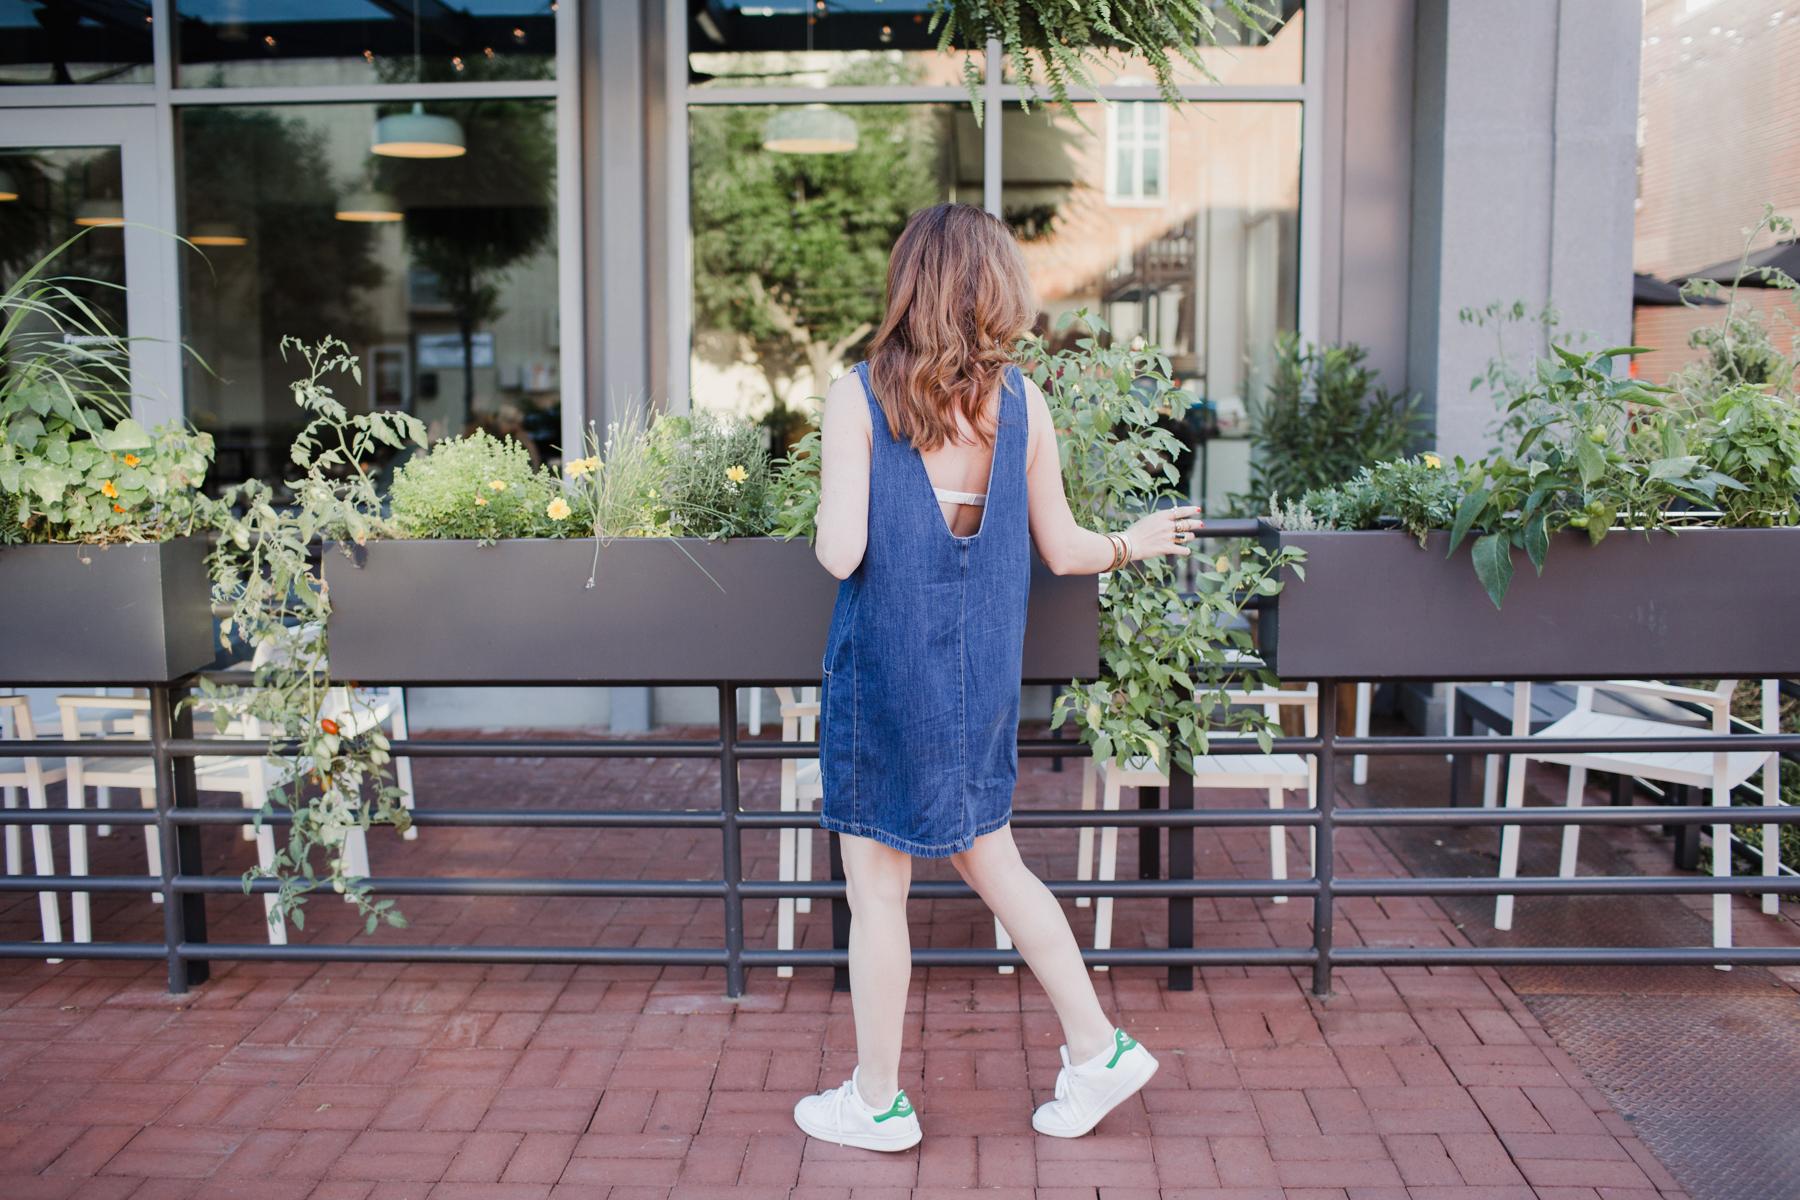 anna_e_cottrell_eldridge_edit_fashion_blogger_mgb_photo_denim_dress_summer_2016_trends_adidas_stan_smith_vintage_jewelry_acne_aviator_sunglasses_coffee_6.jpg